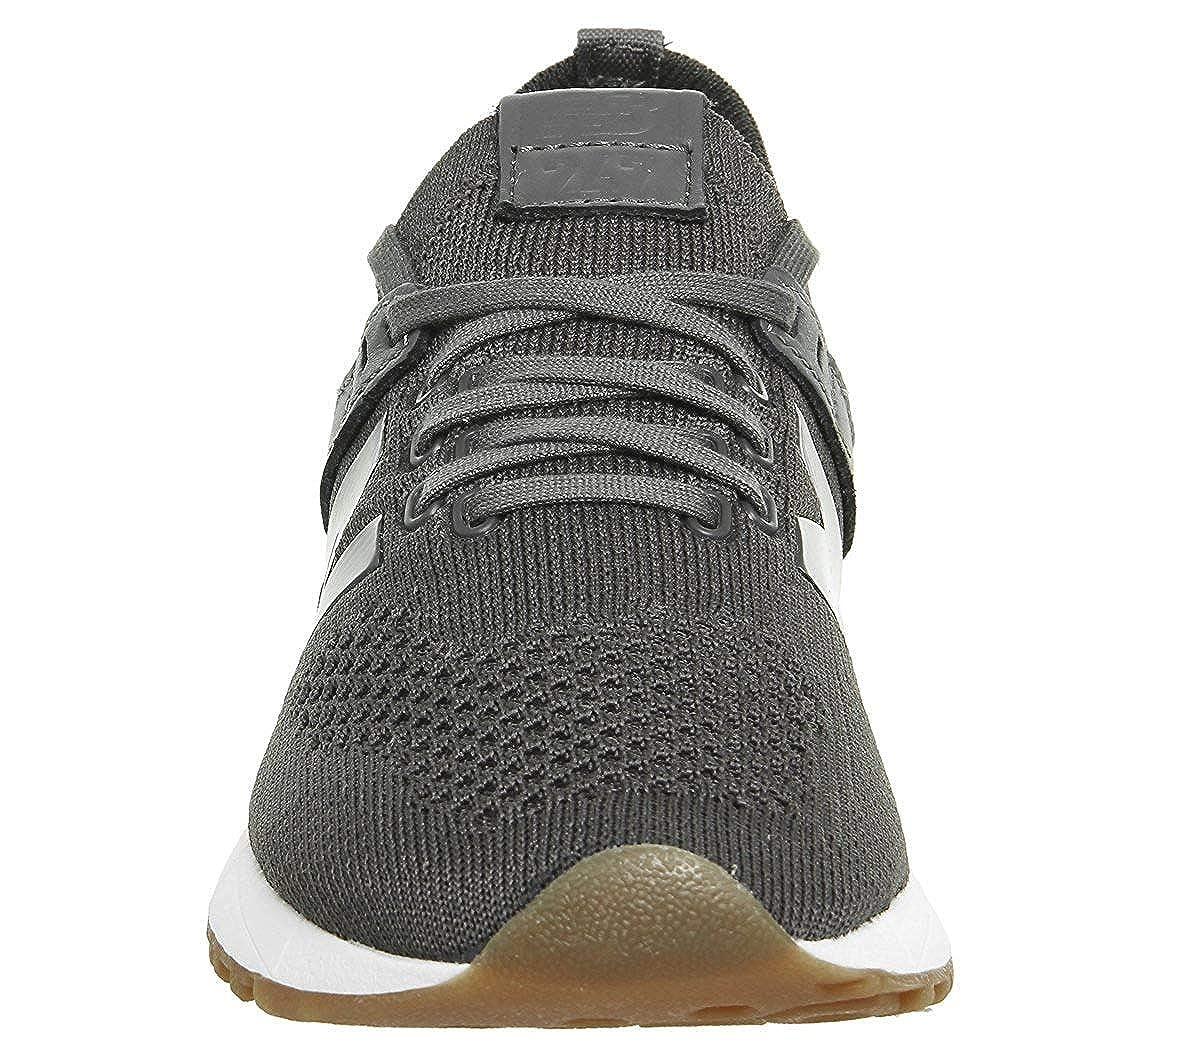 New Balance - - Balance Frauen Modern Classics WRL24 Schuhe, 43 EUR - Width B, grau Weiß 75b2f7